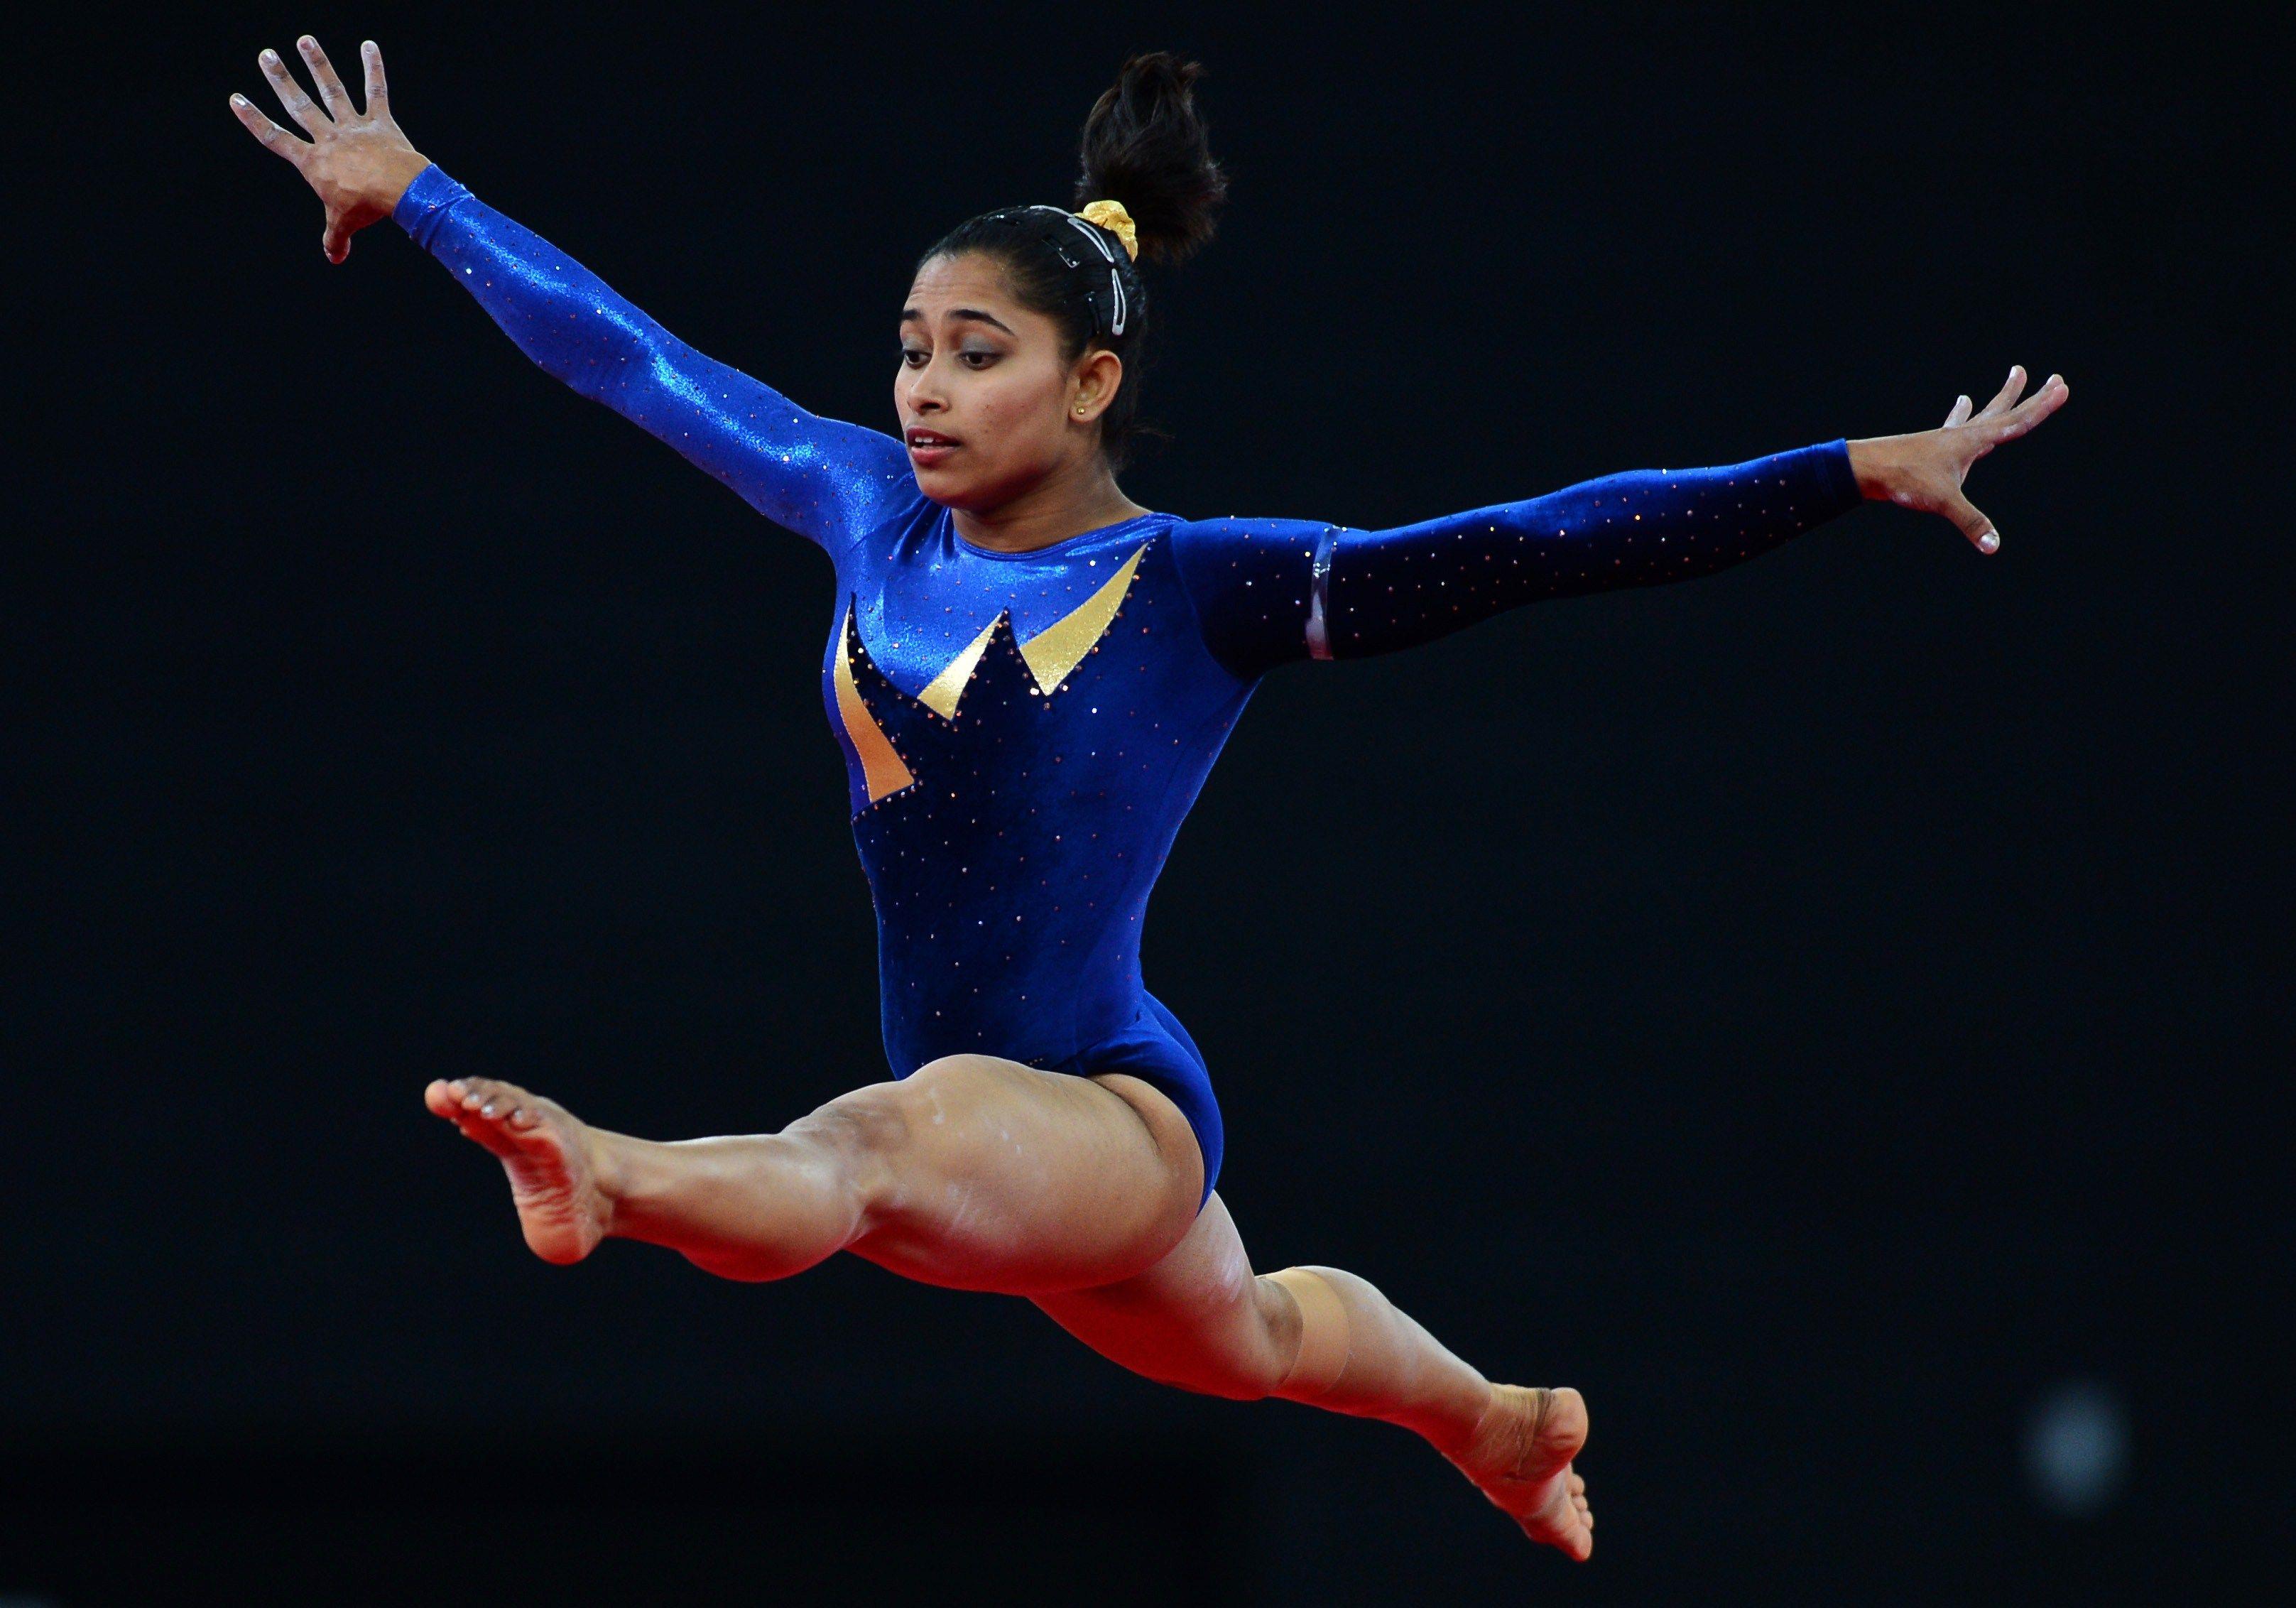 online gymnastics classes in india